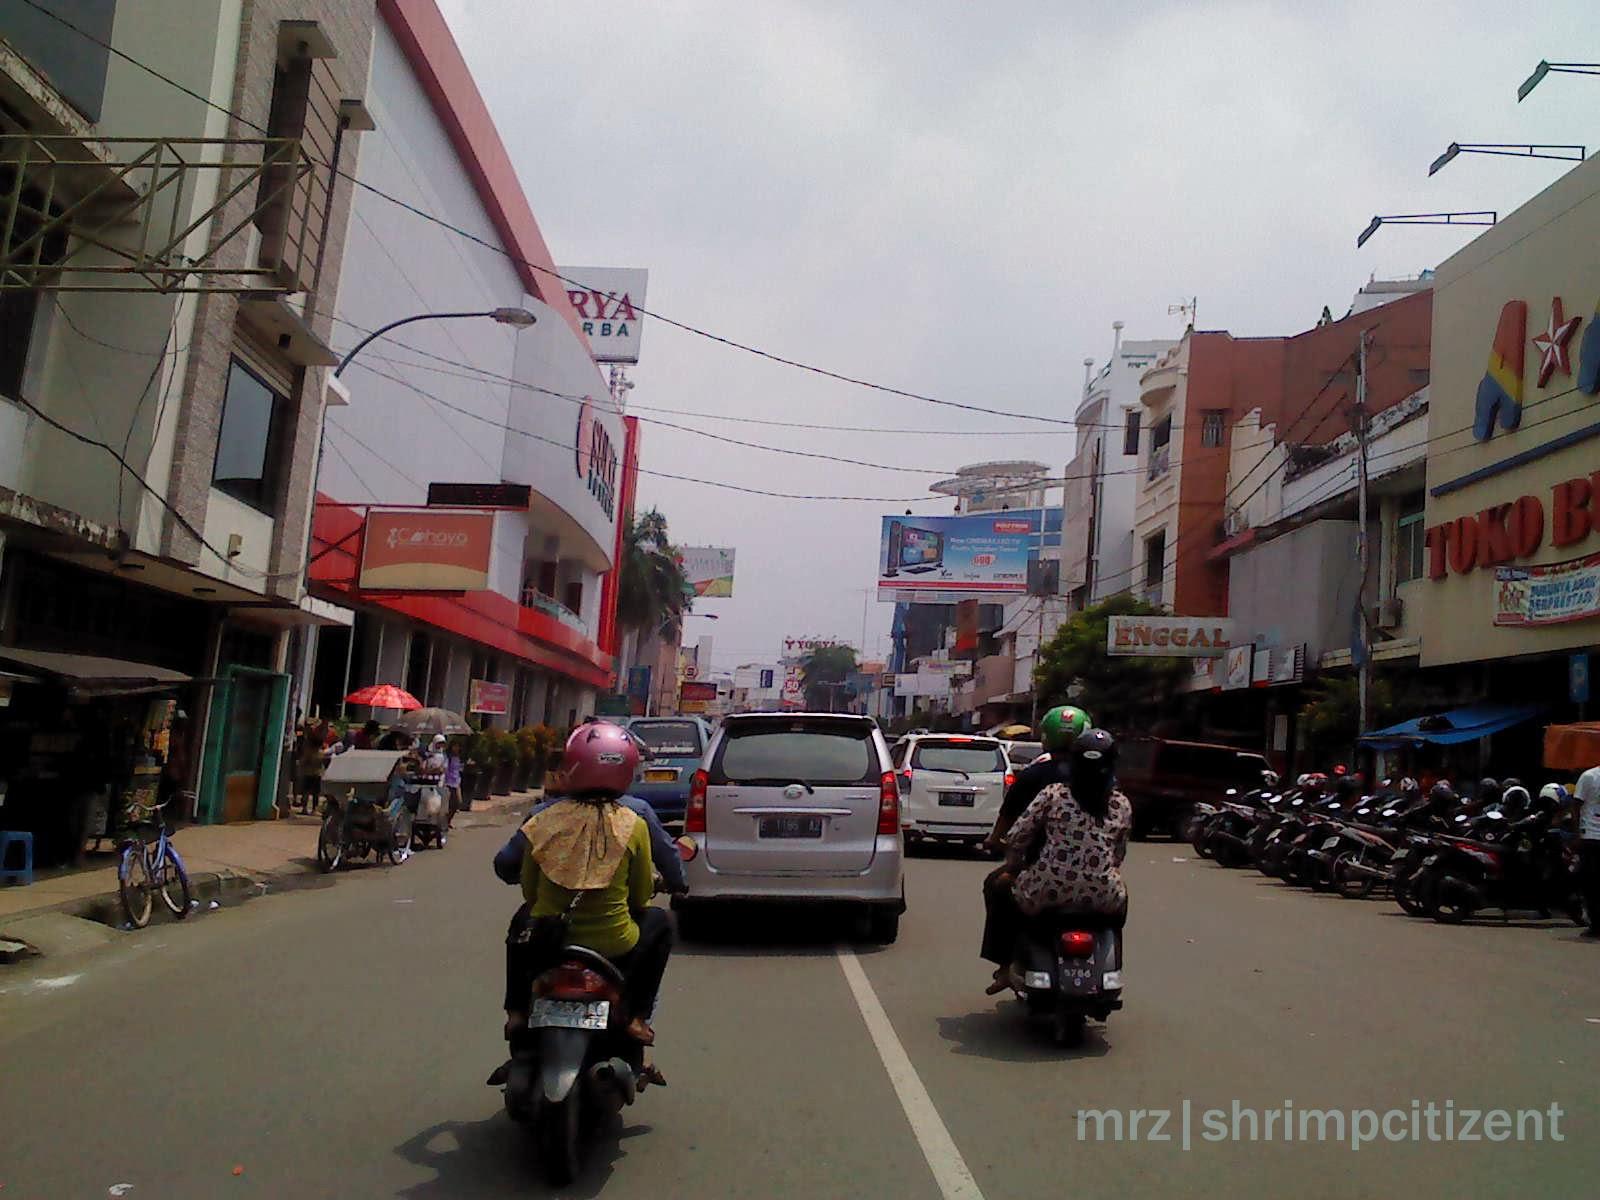 jl. Karanggetas Cirebon 1